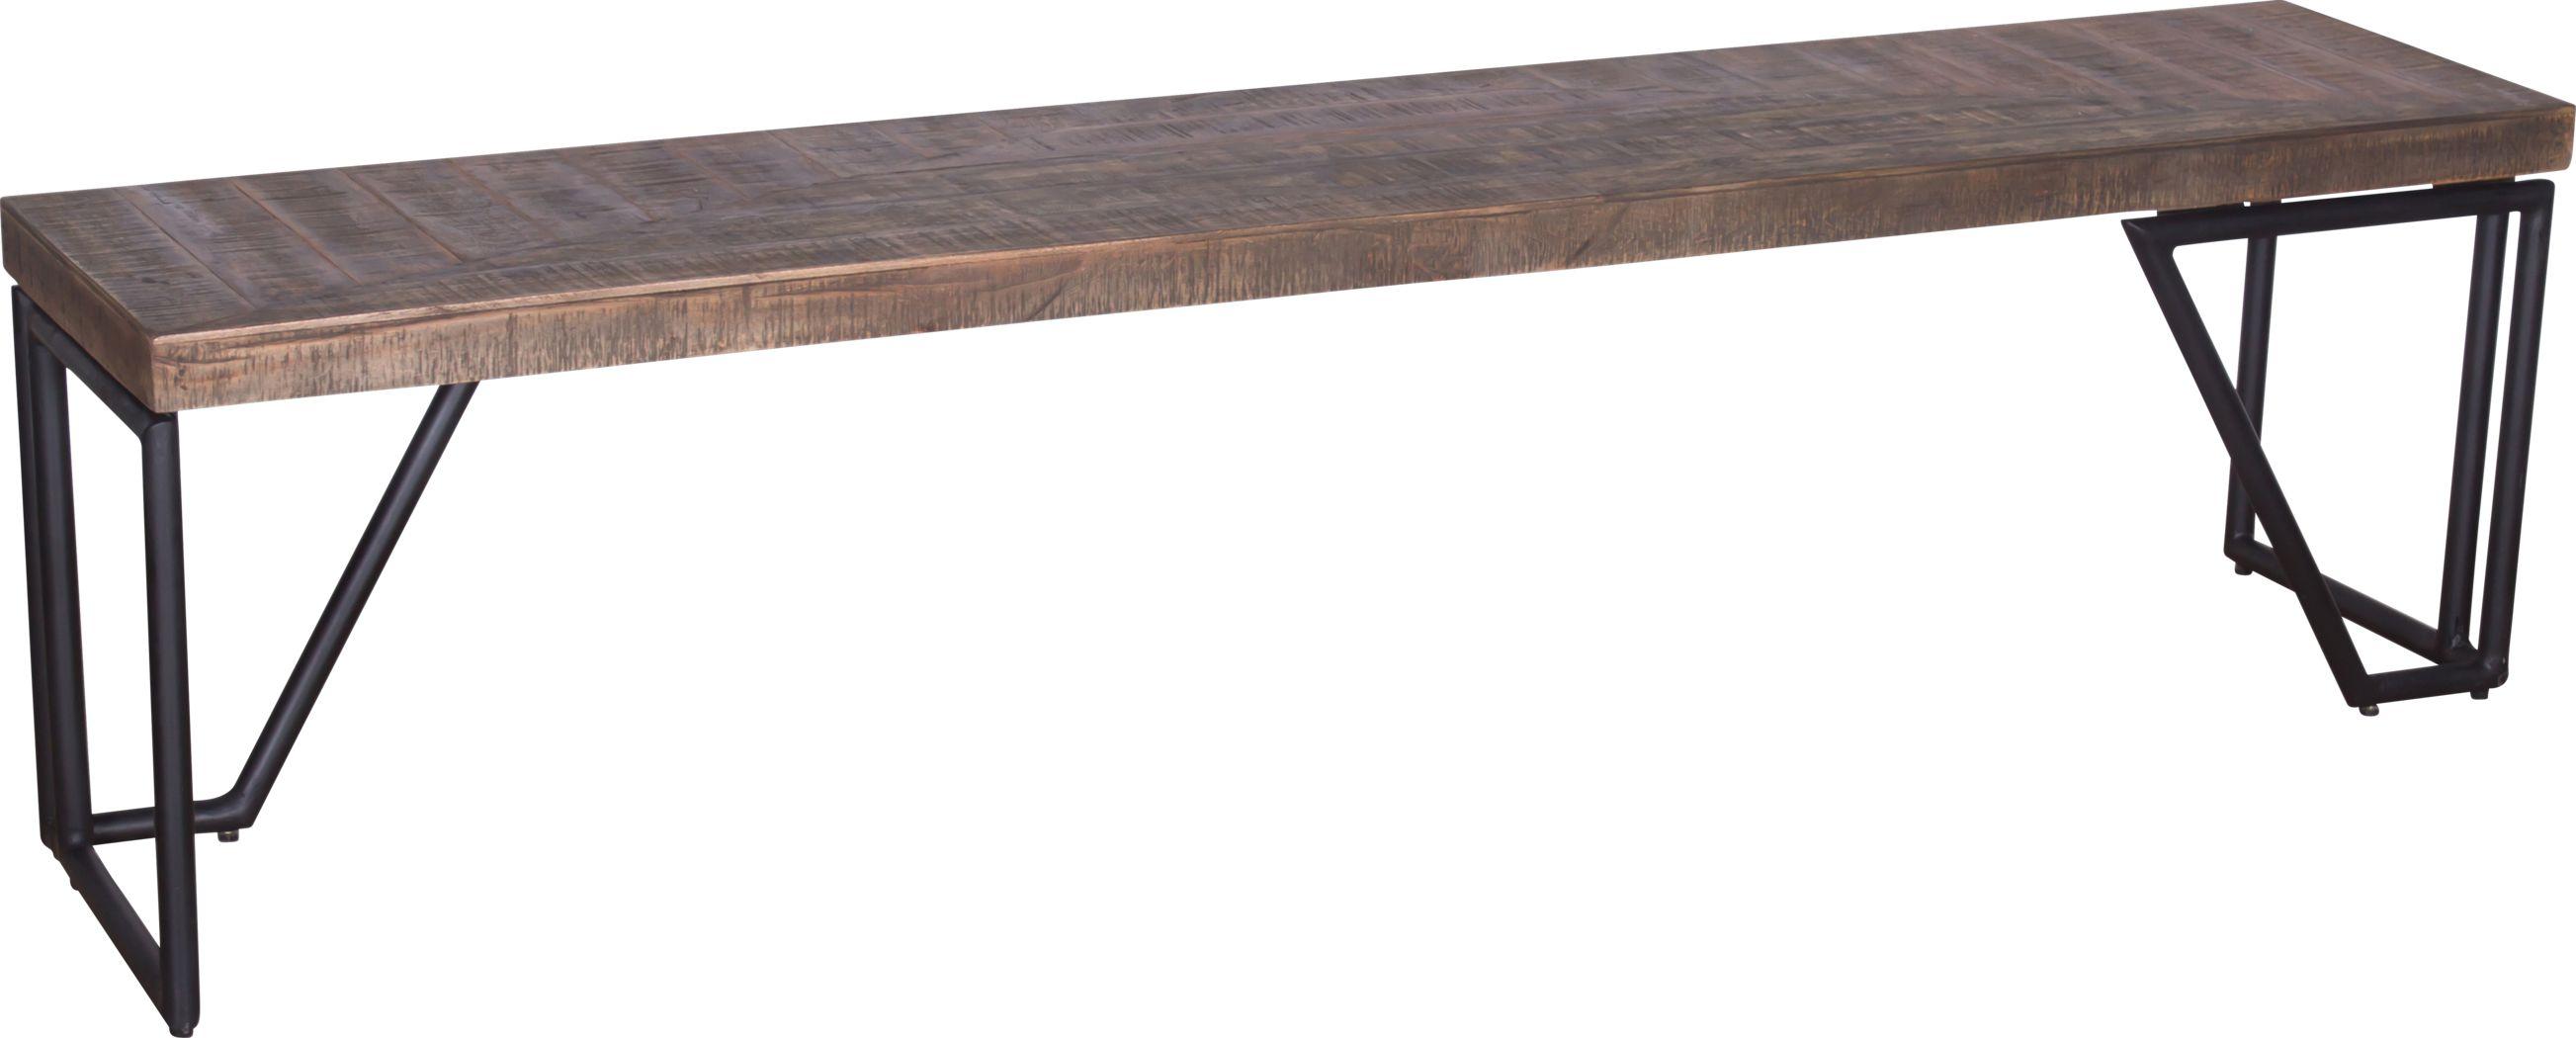 Balsan Brown Bench